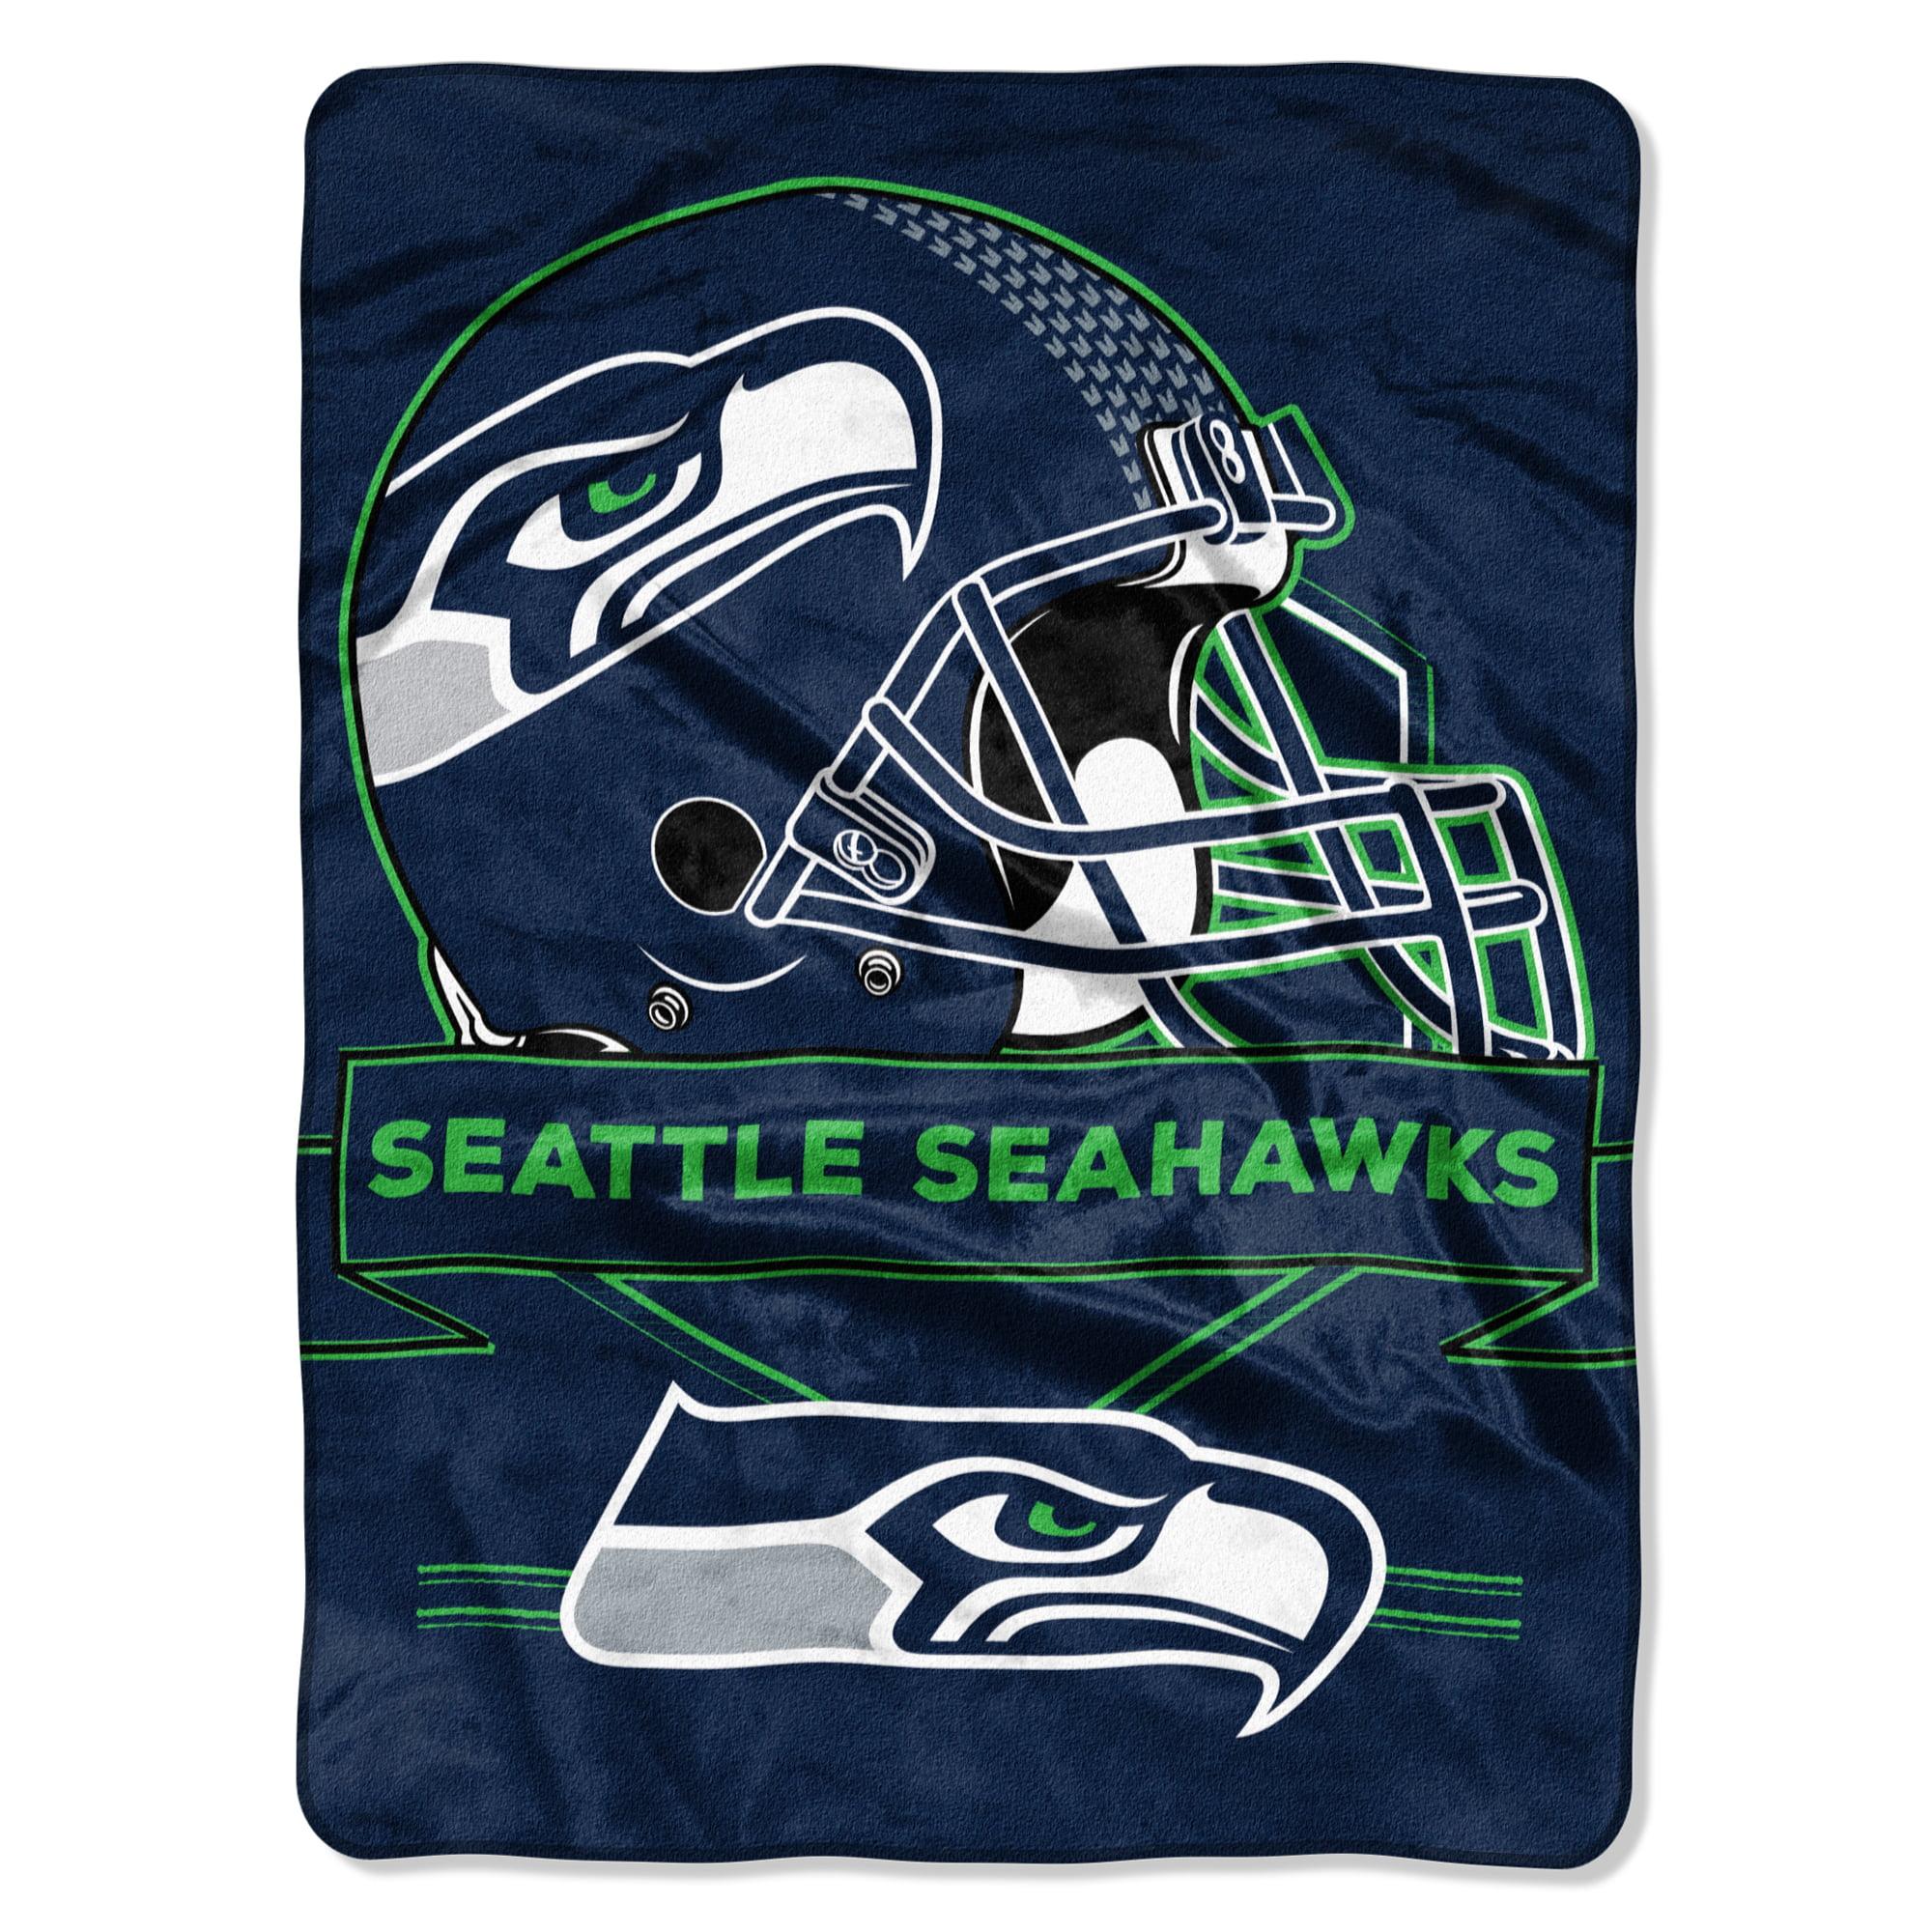 "Seattle Seahawks The Northwest Company 60"" x 80"" Prestige Raschel Blanket - No Size"